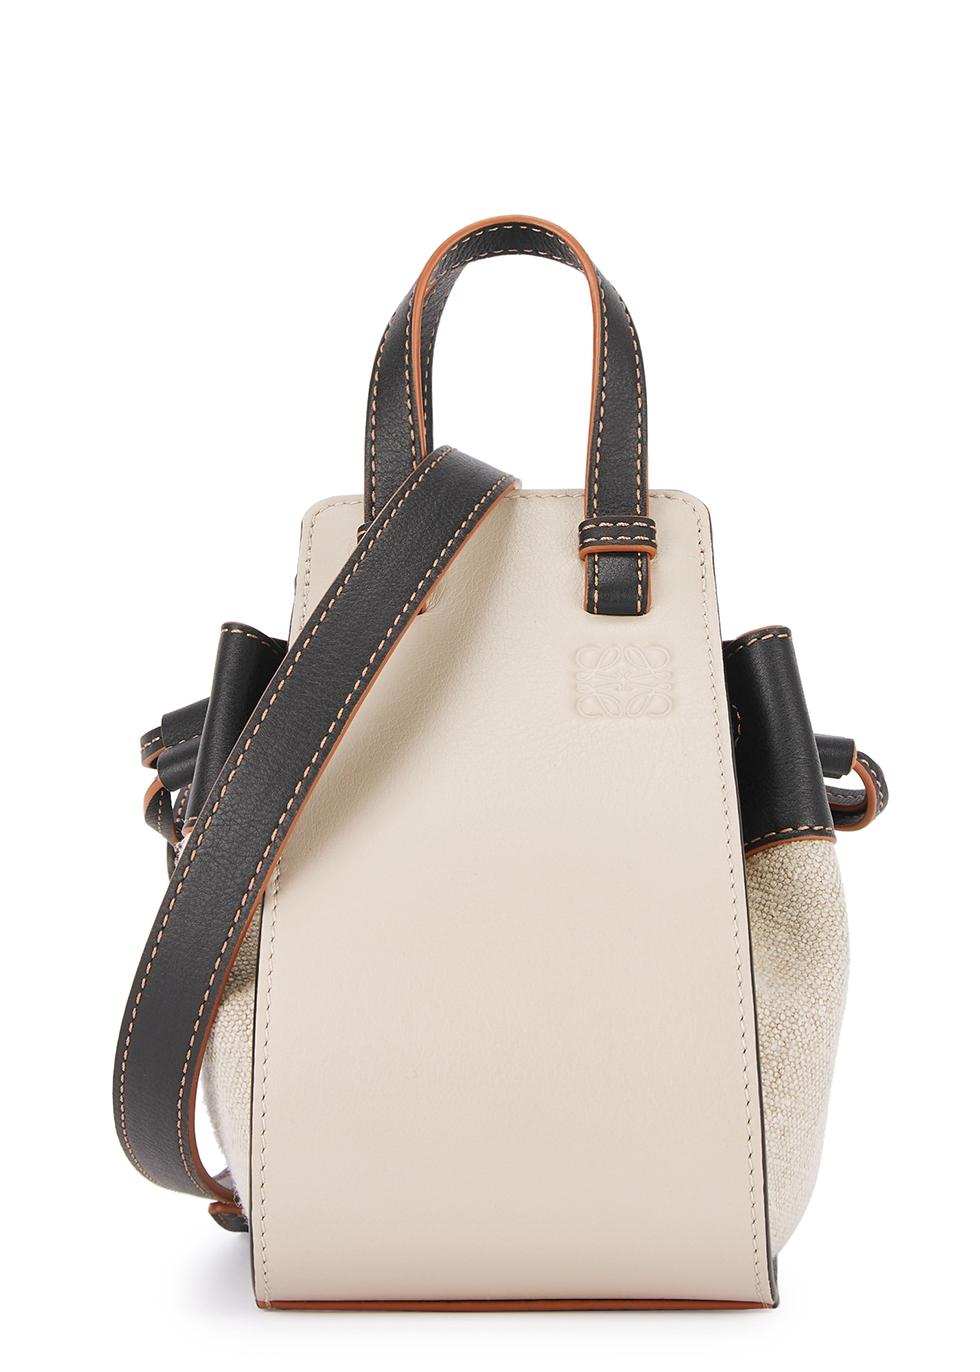 Hammock cream canvas and leather cross-body bag